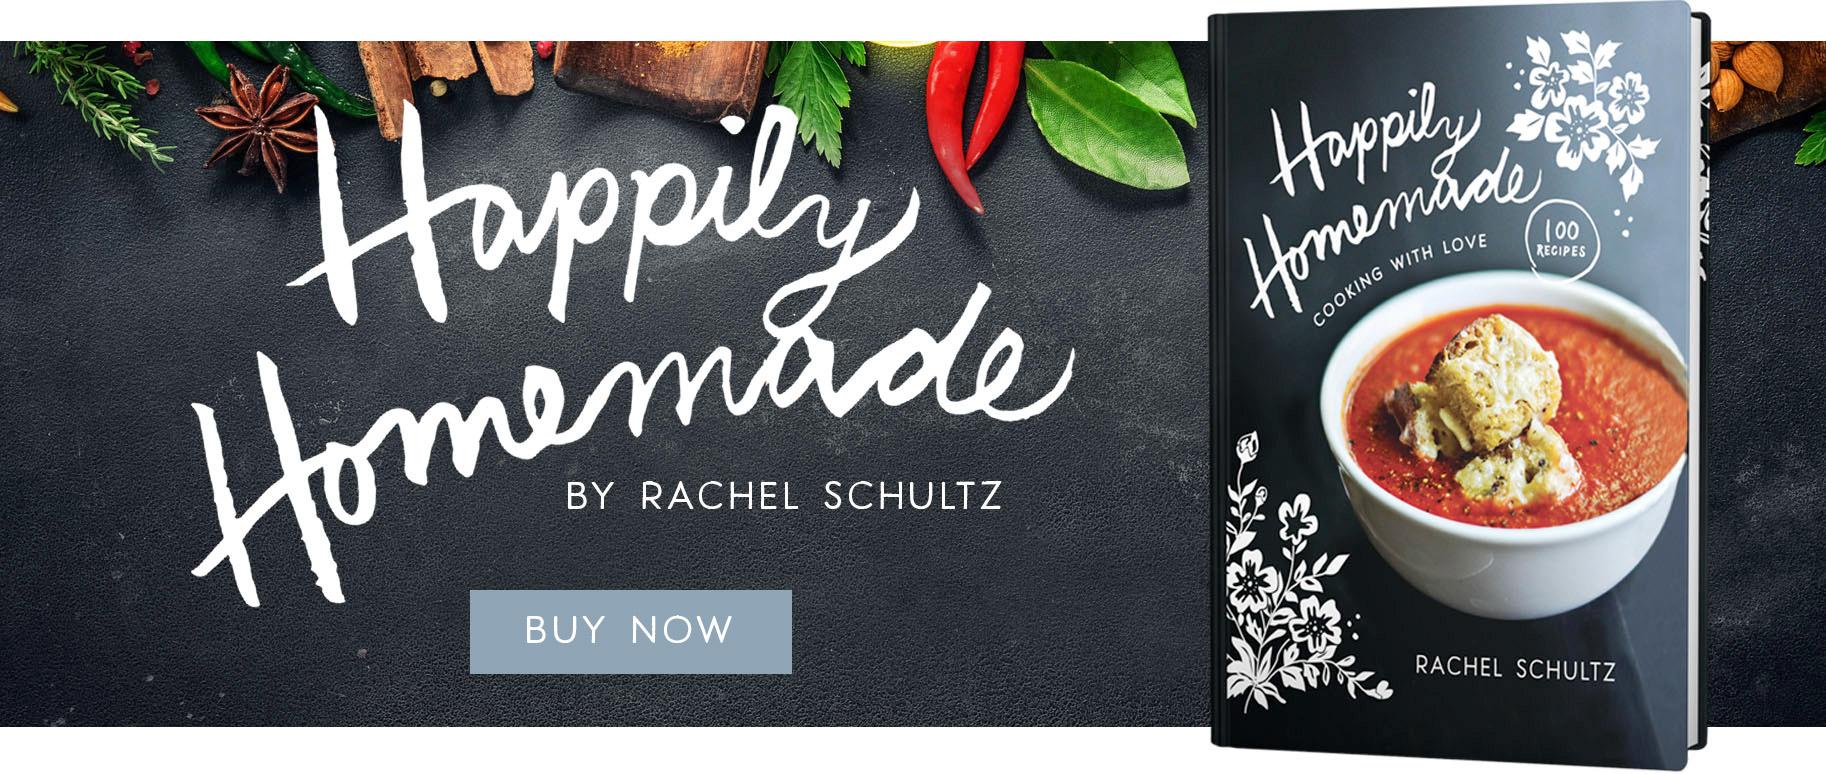 Happily Homemade